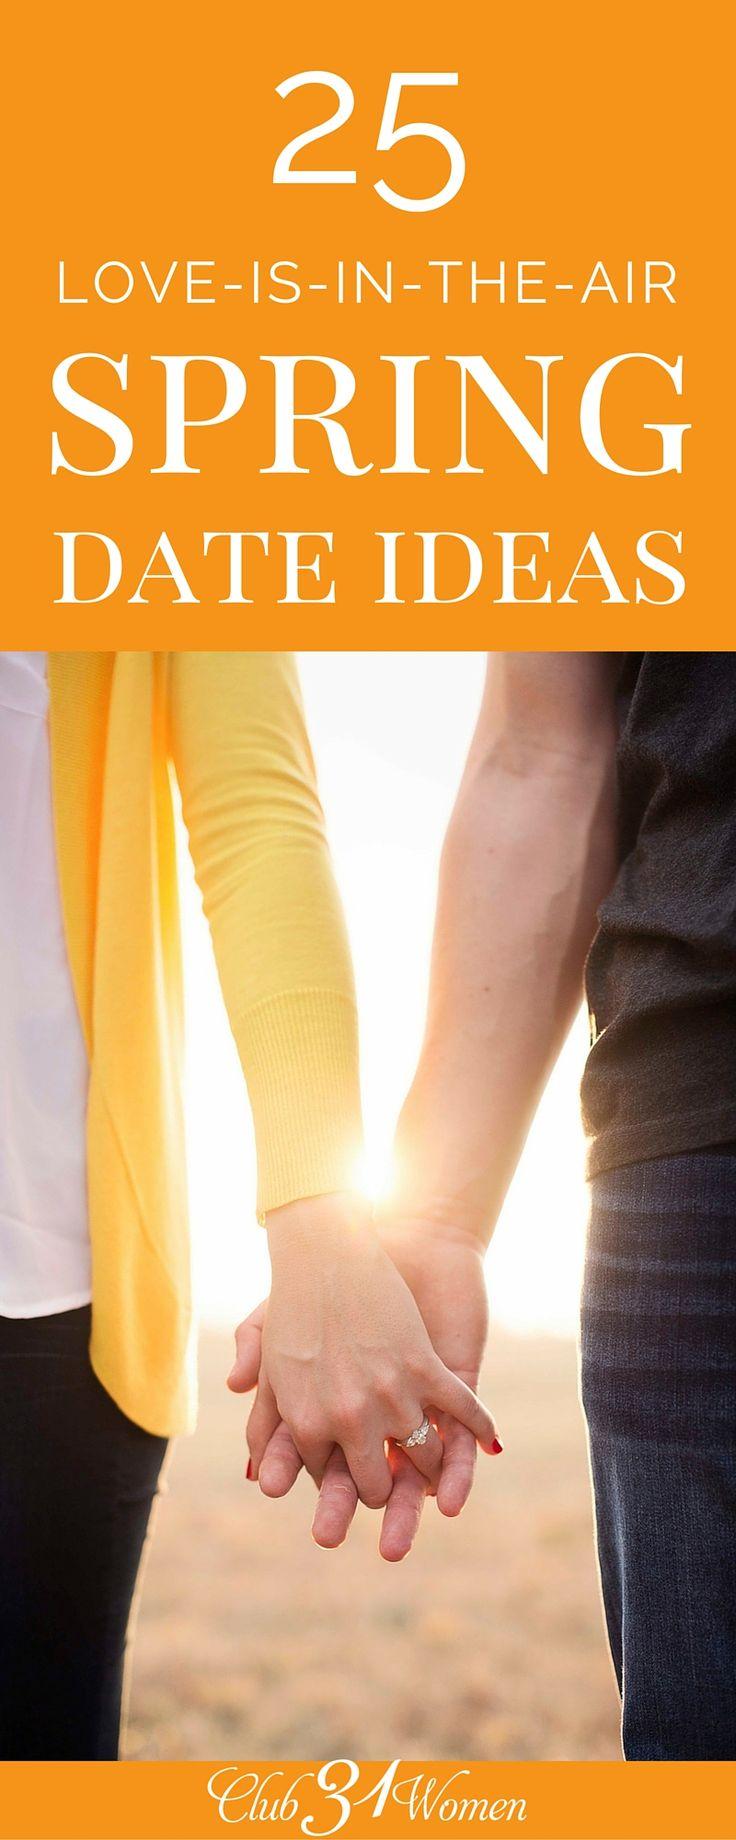 Do something dating